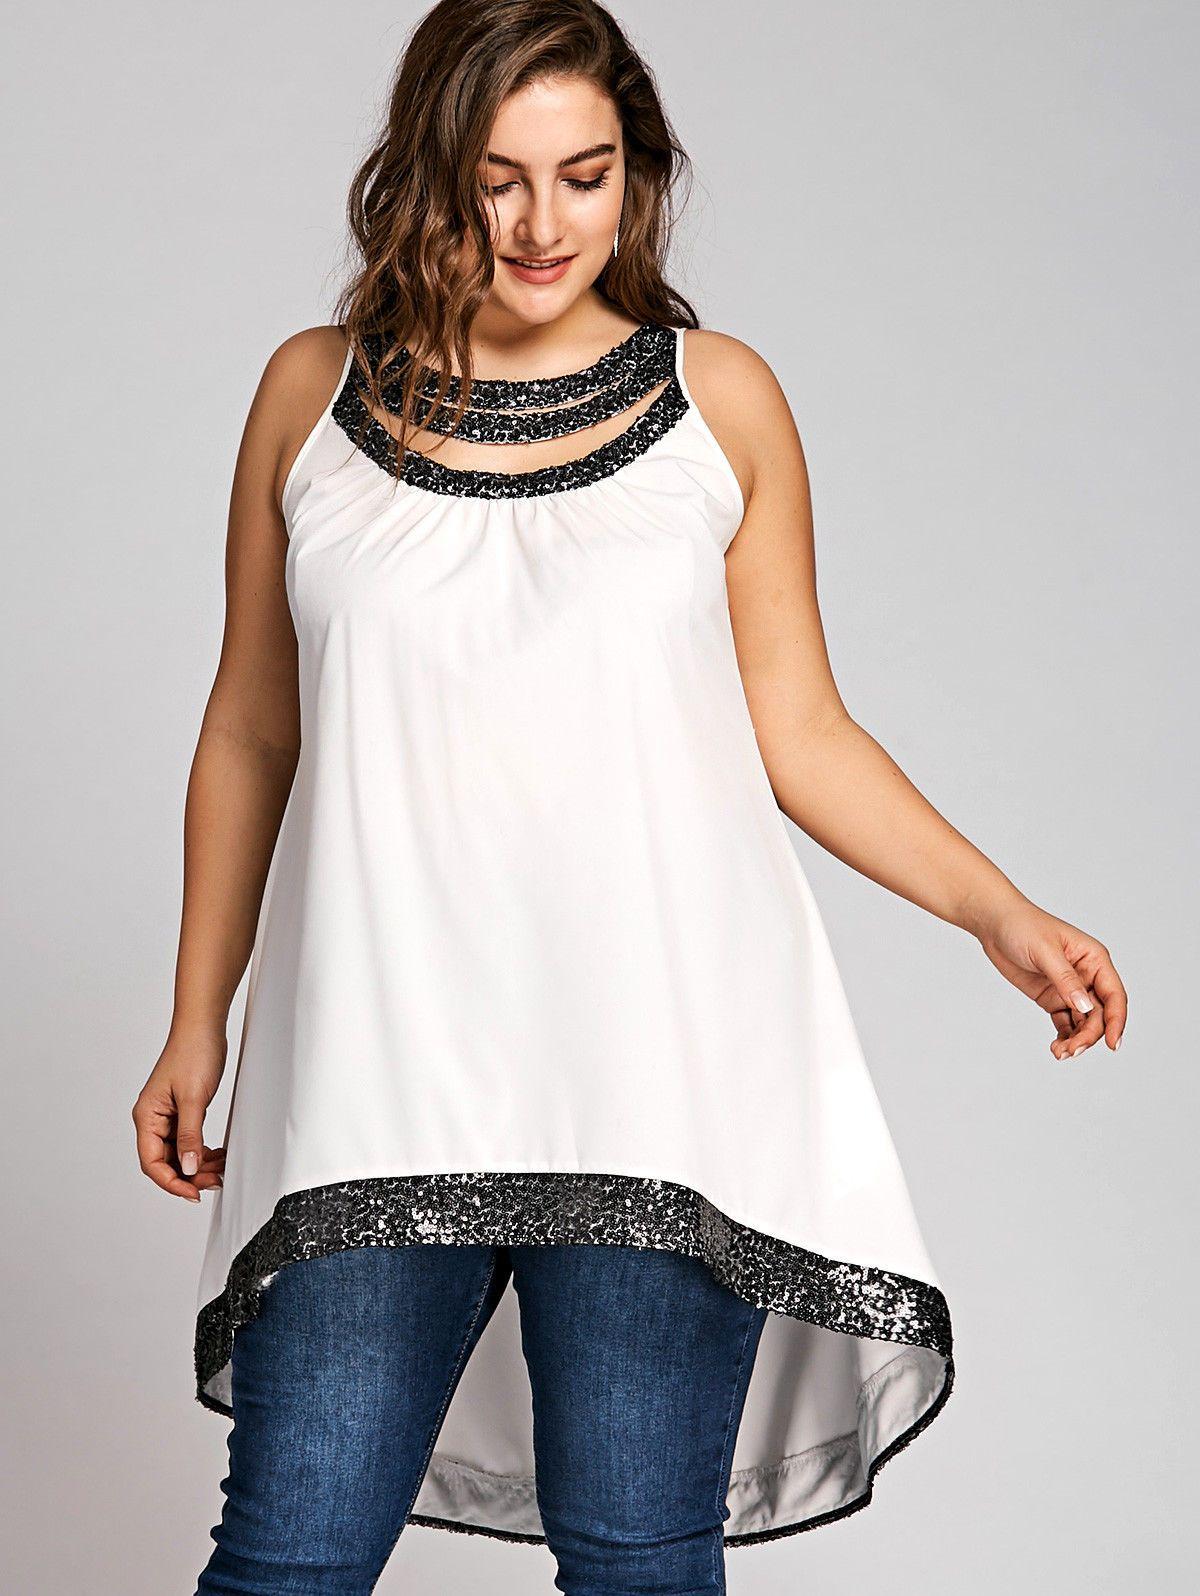 984741473f0de  10.44 - Plus Size Sequined Trim Sleeveless Womens T-Shirt Longline Short Blouses  Tops